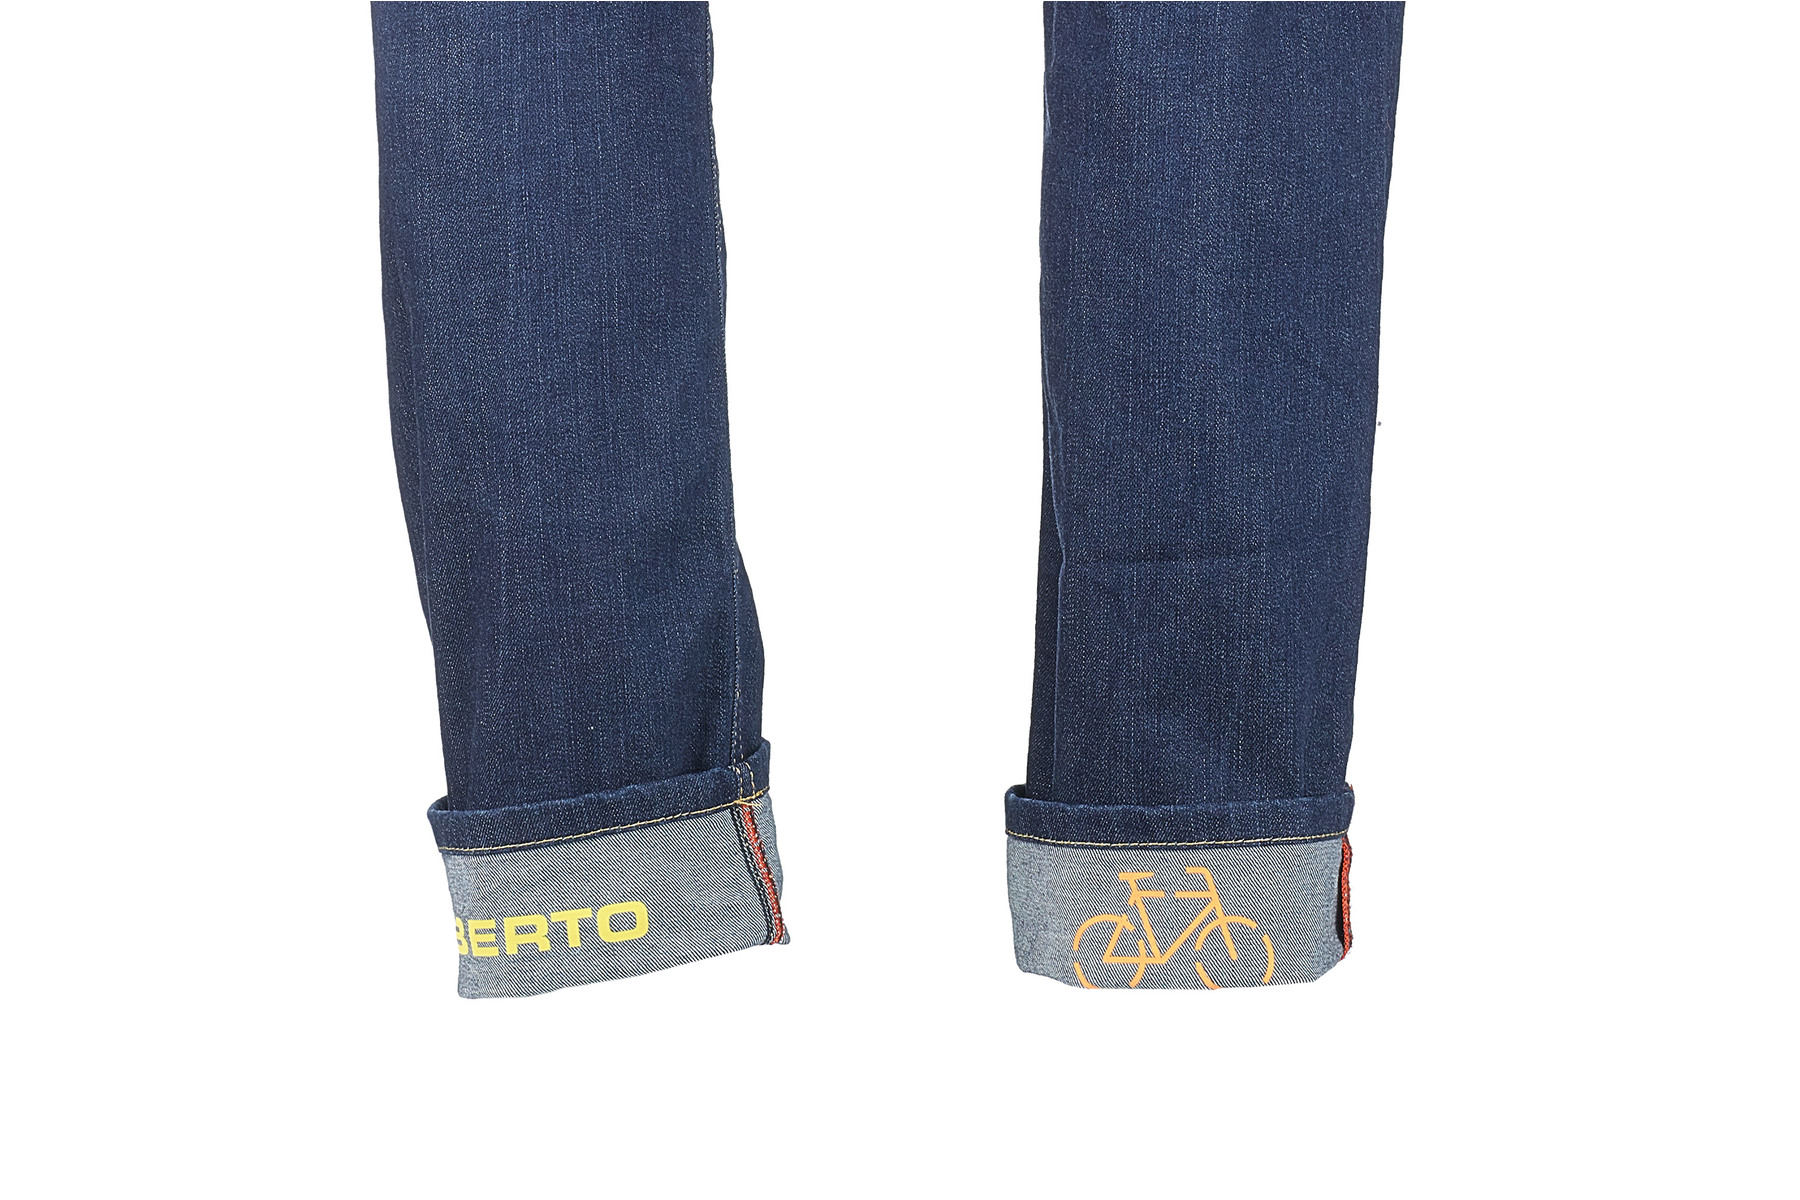 ALBERTO ECOREPEL DENIM Jeans 2017 kaufen | ROSE Bikes